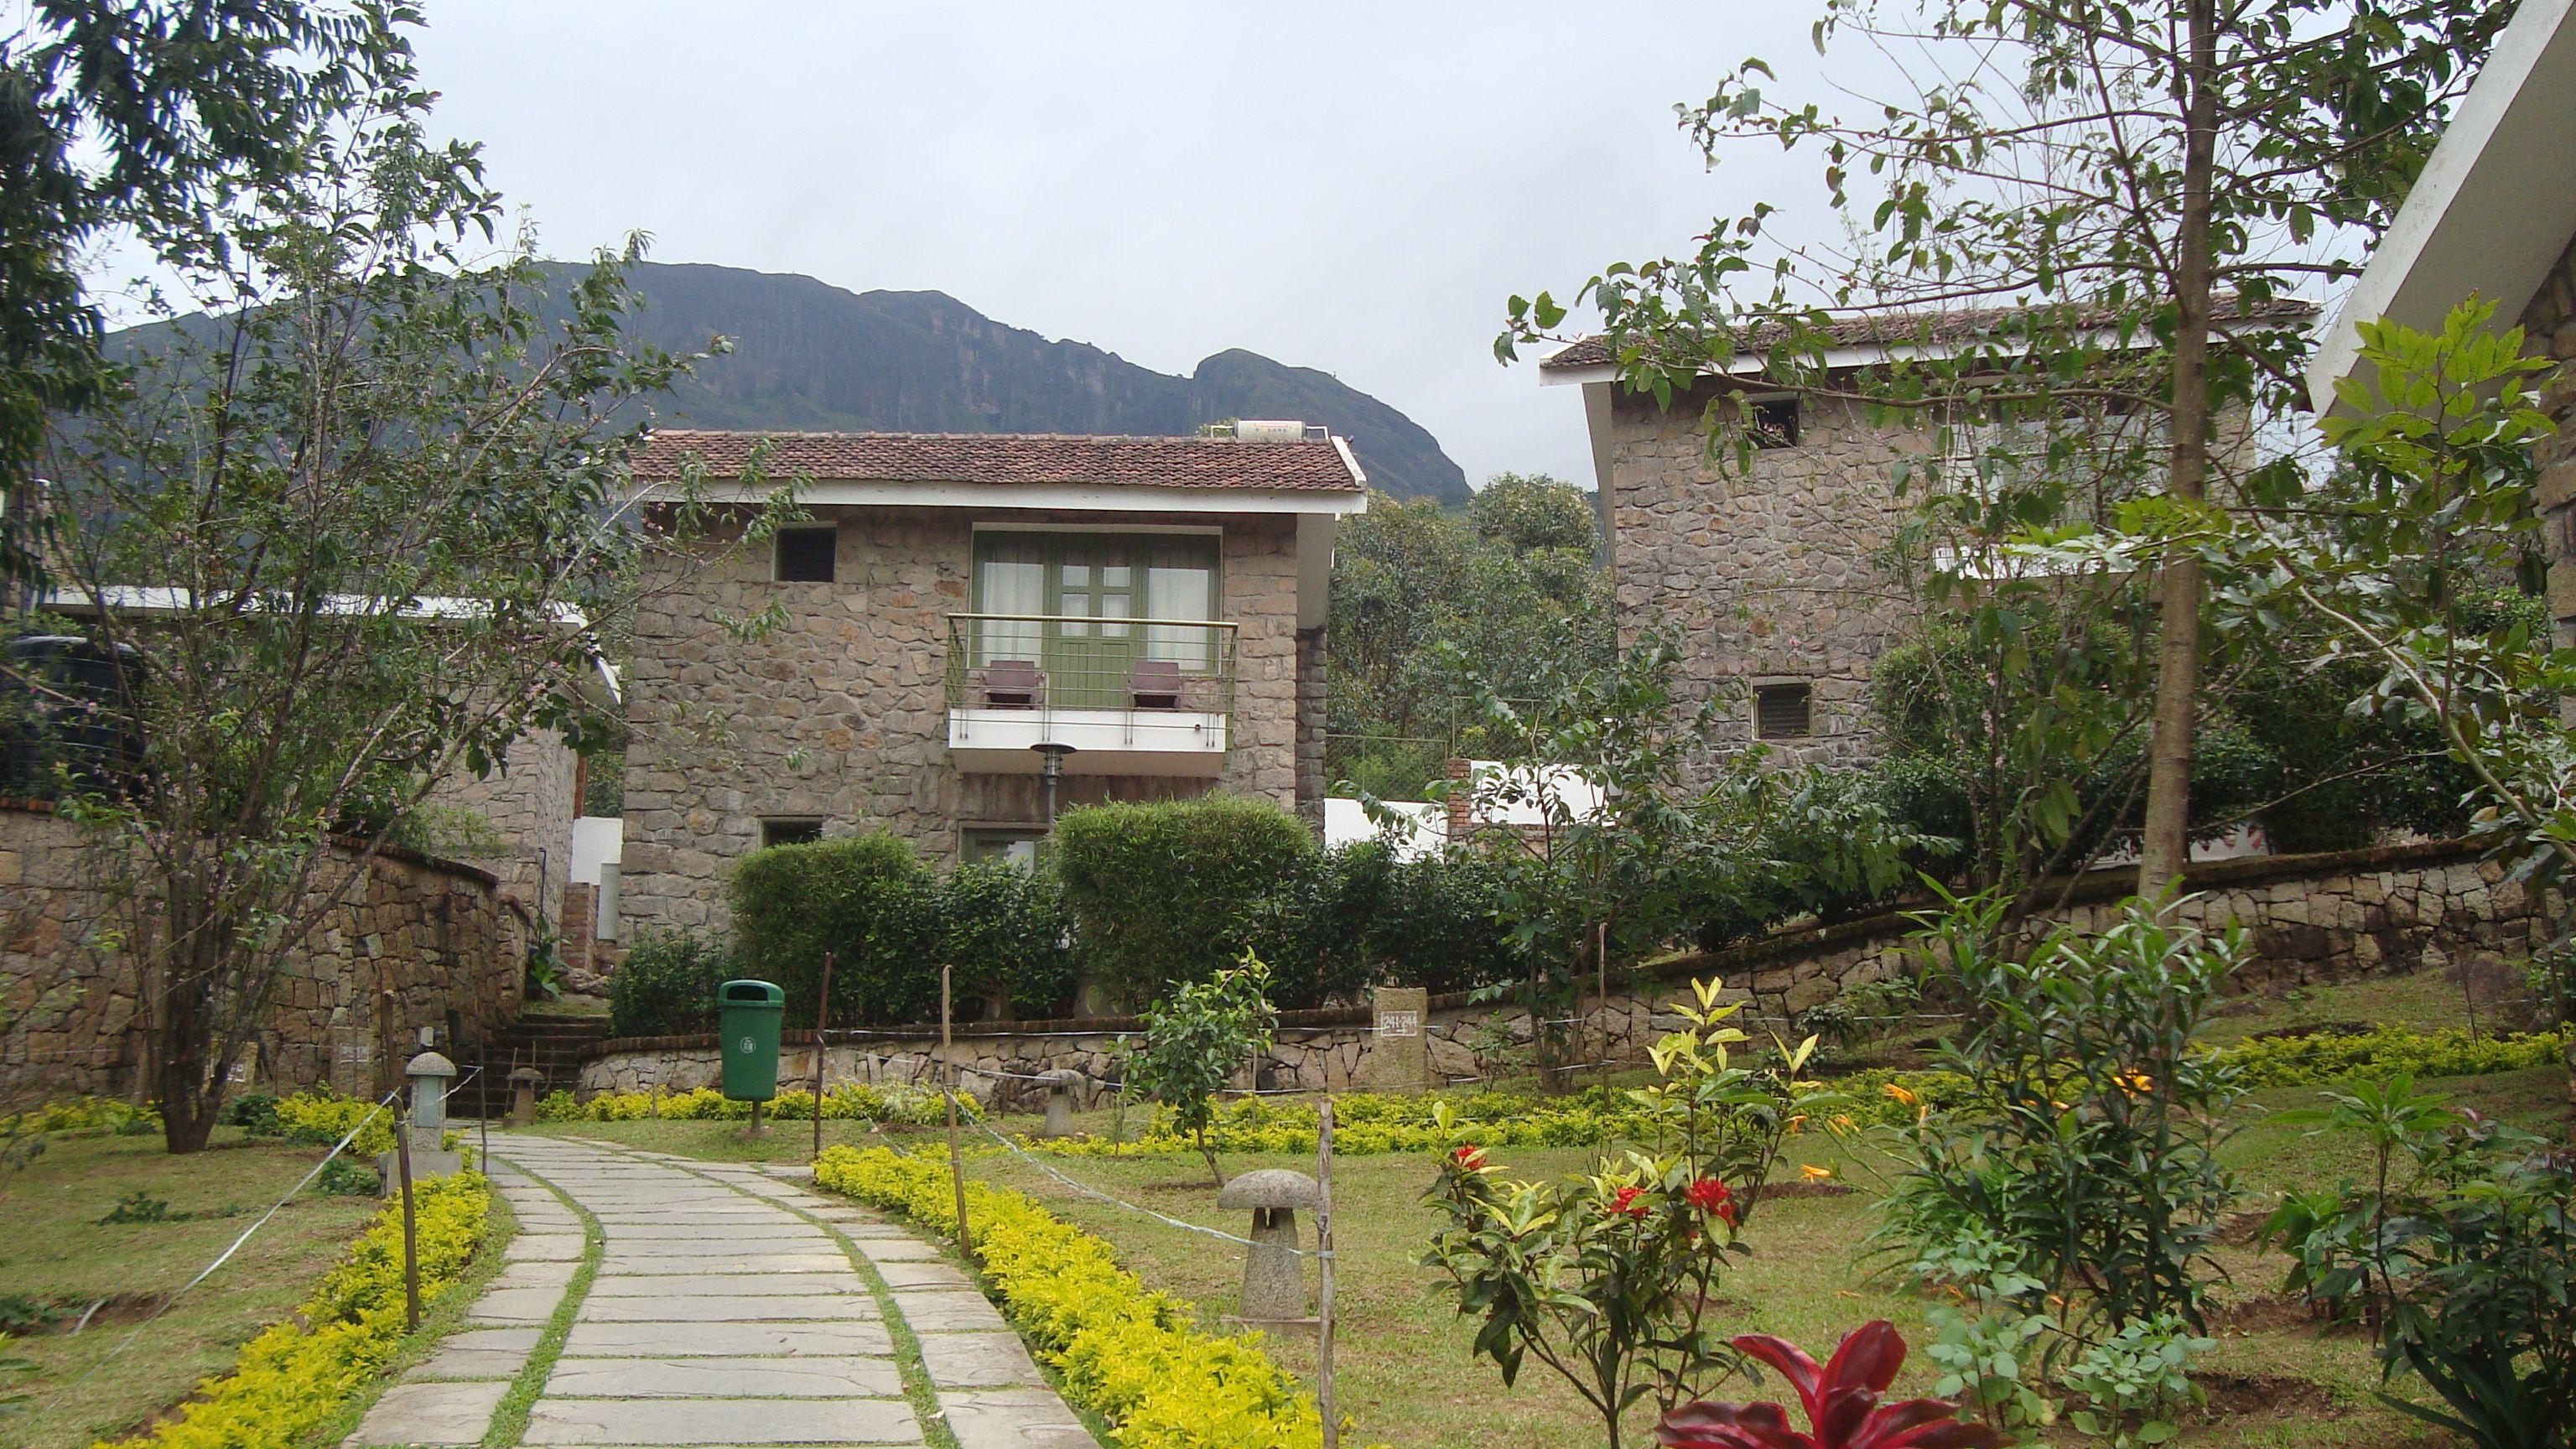 evm mountain club resort - munnar/kerala   evm mountain club resort